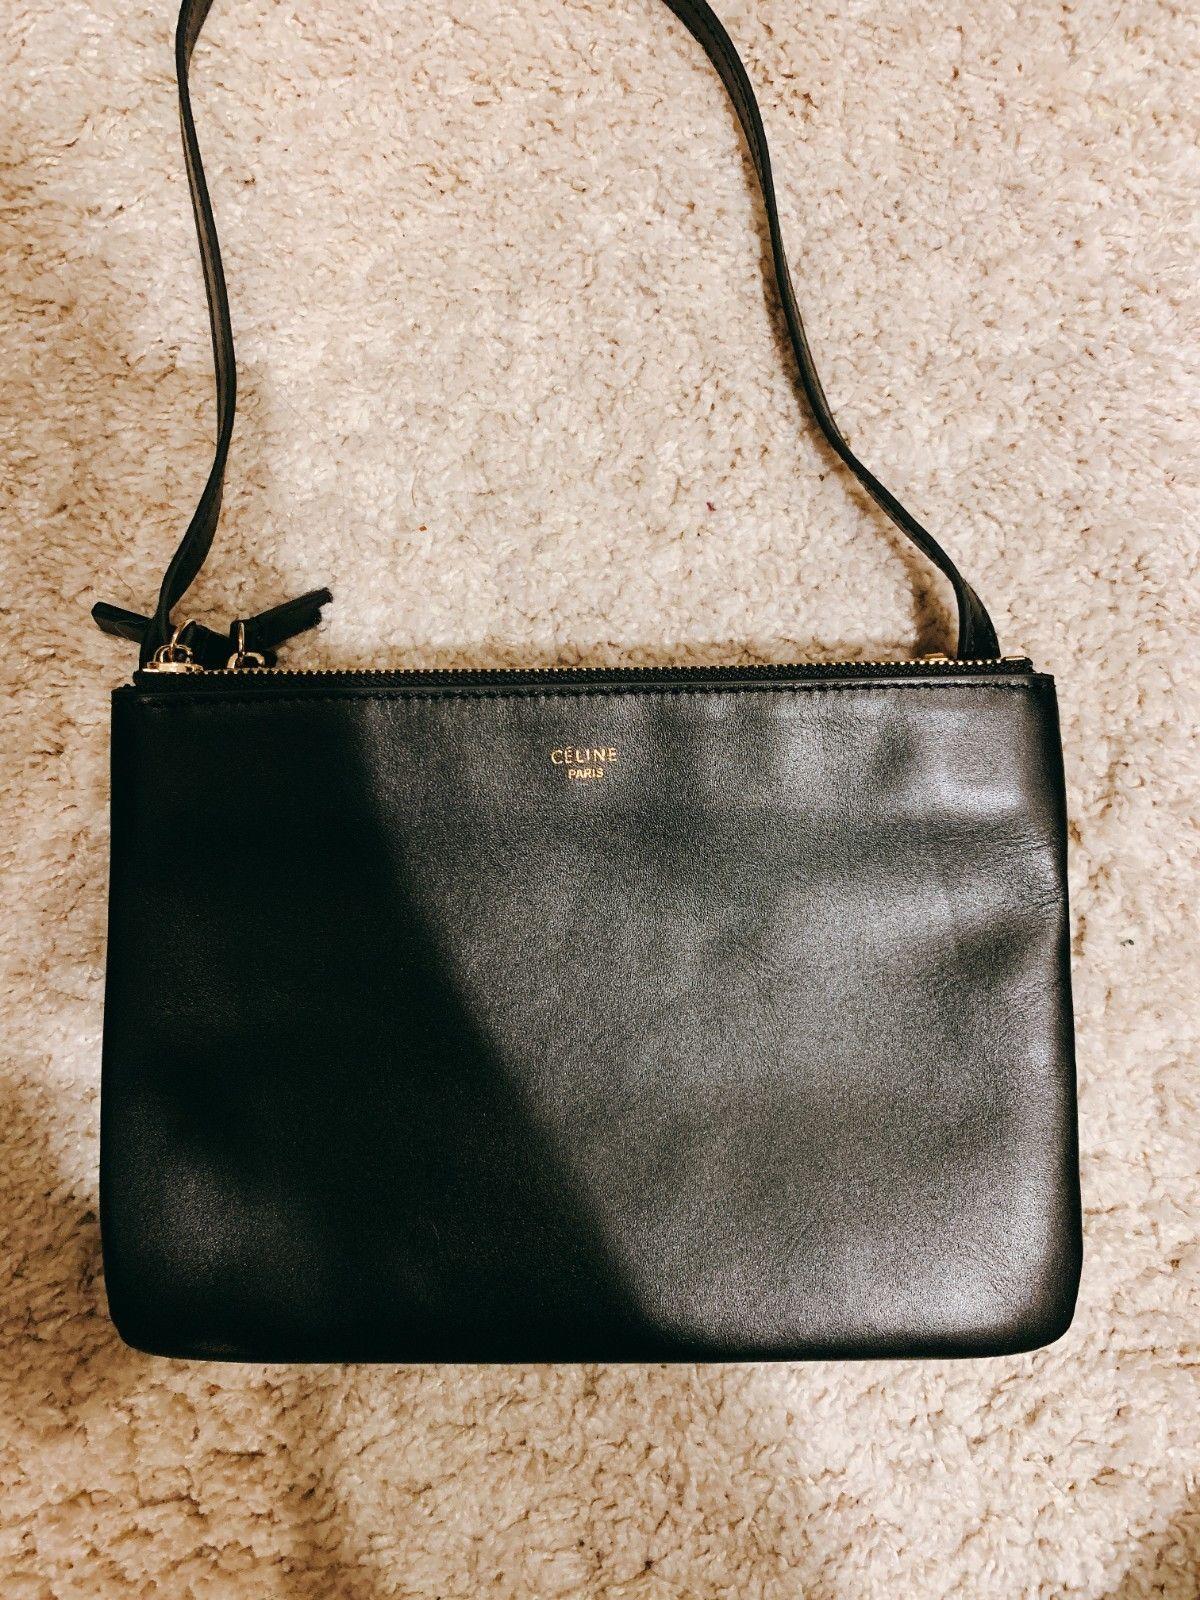 CELINE Trio Large Black Leather Cross Body Bag | Crossbody